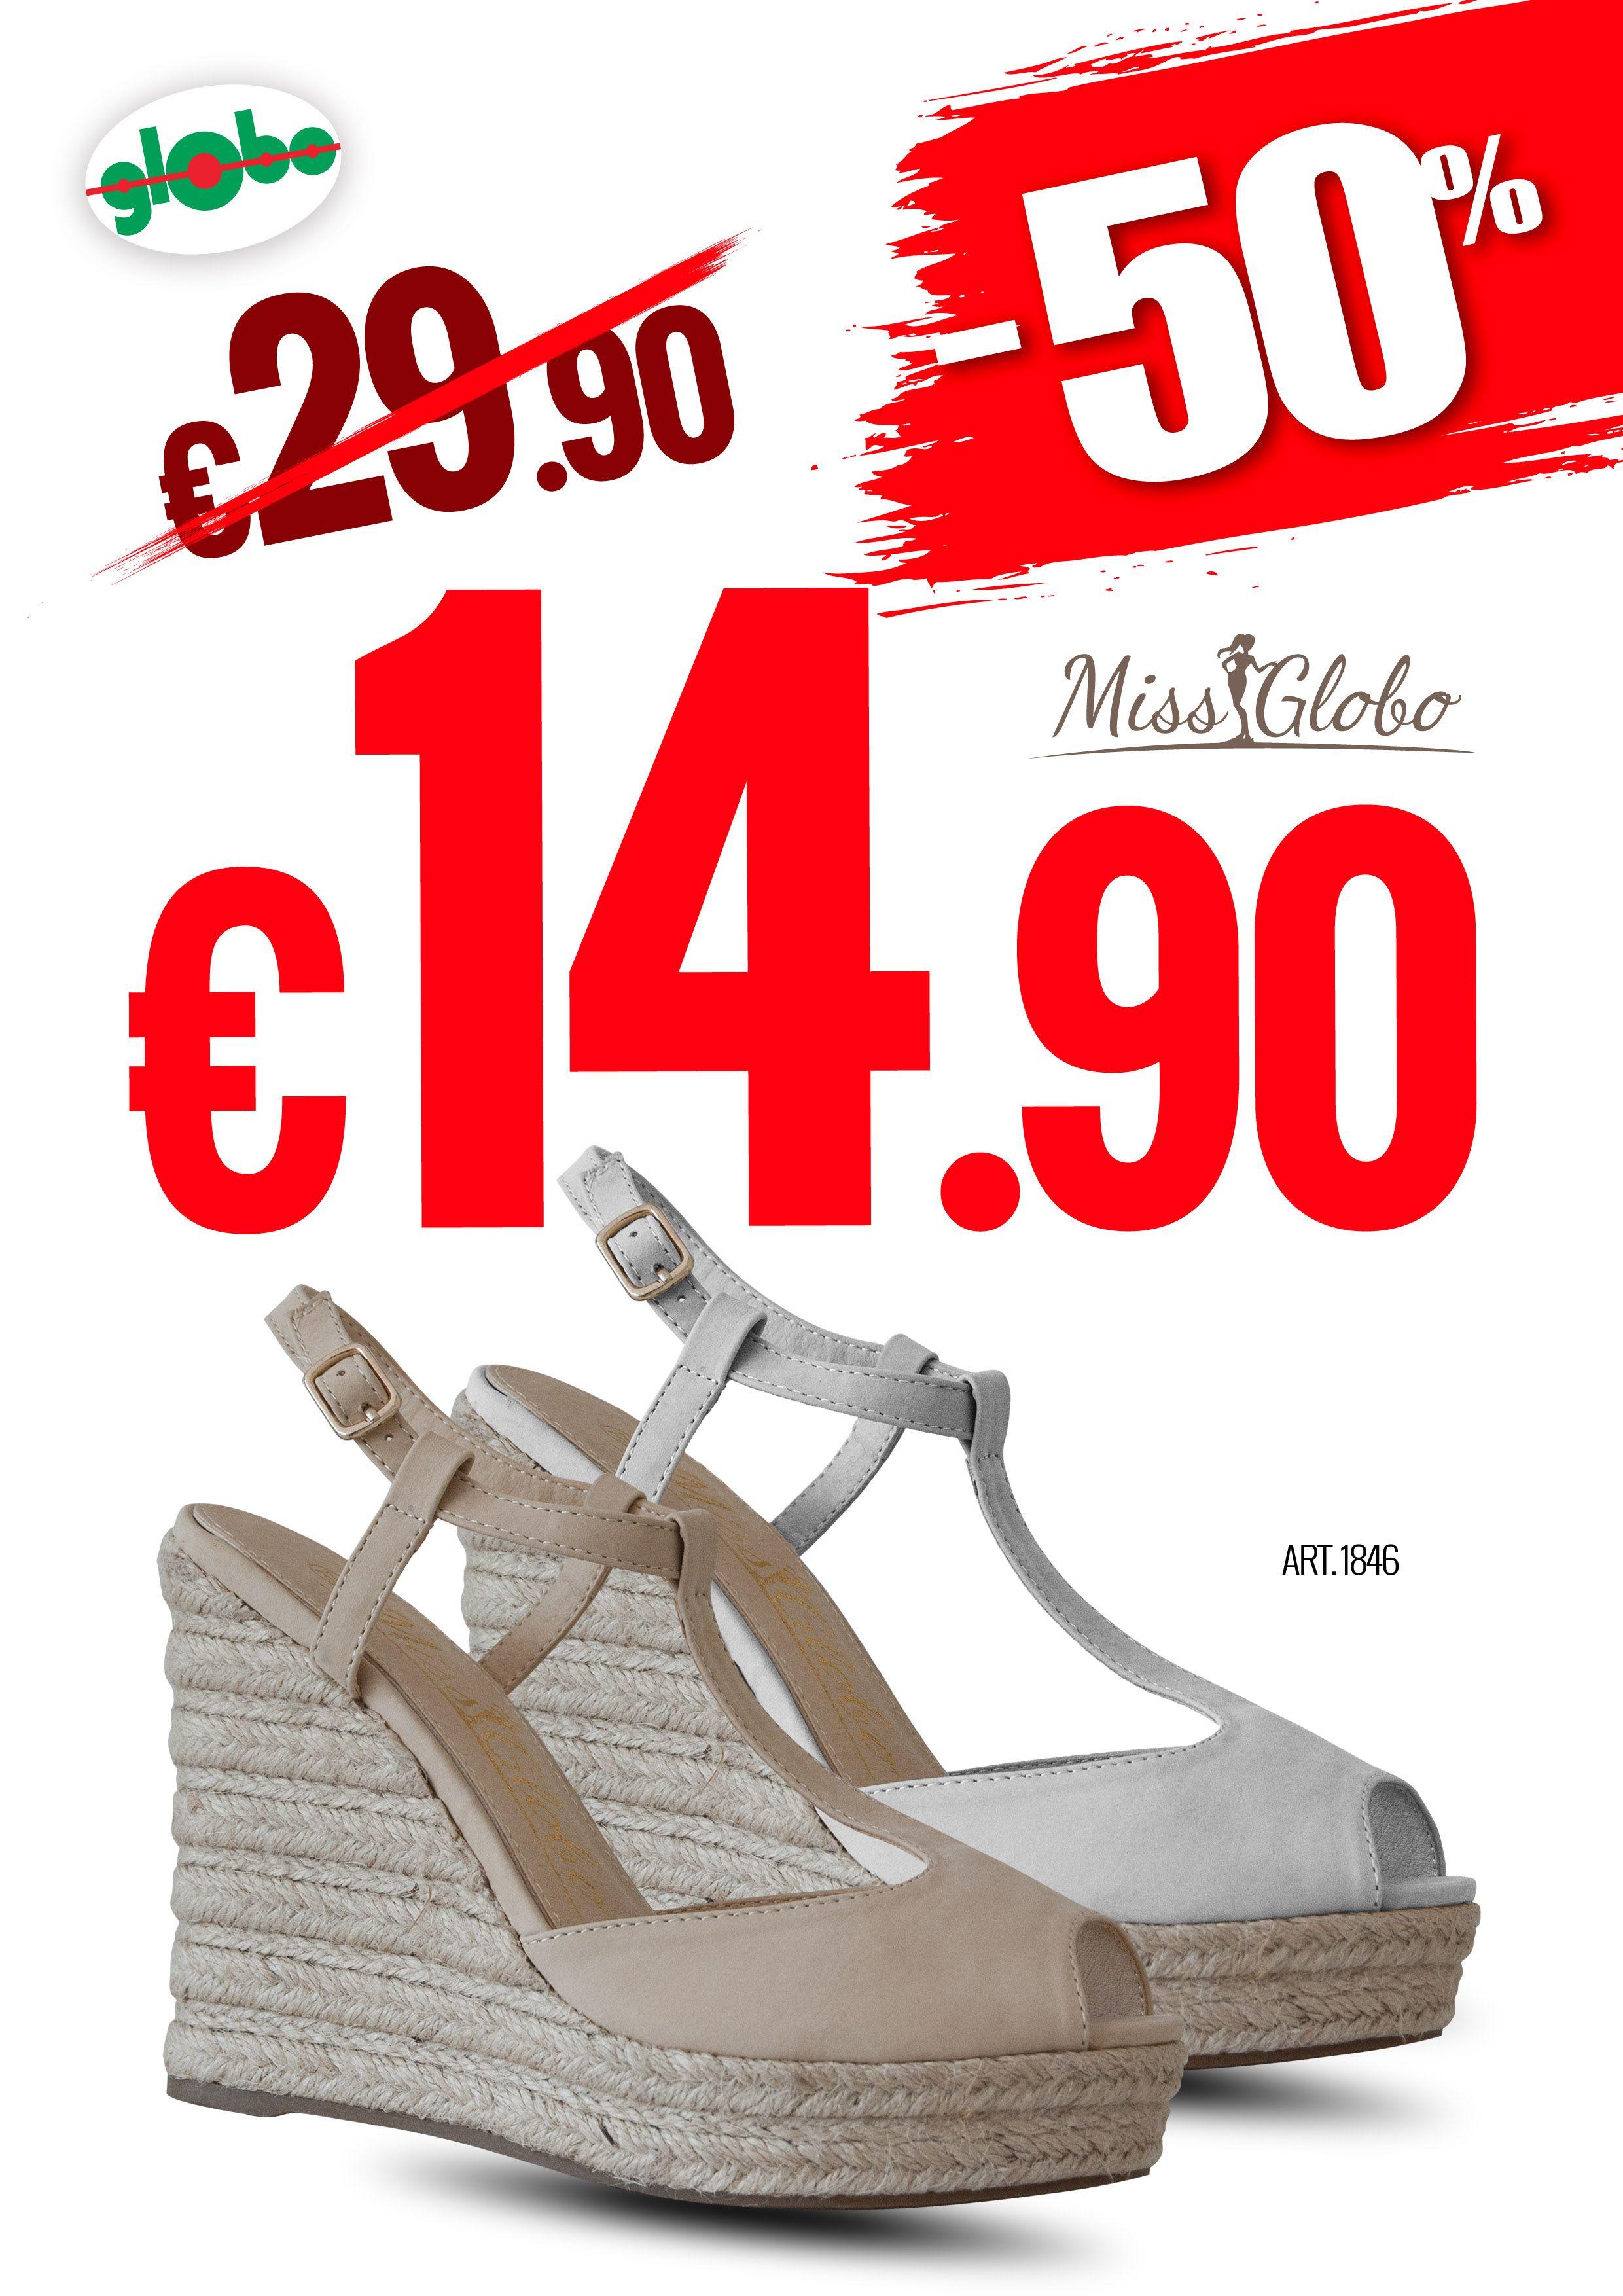 502014 Sandalsheels Donna Calzature Globo E Miss Shoes Dbcexo A c34jLSA5Rq